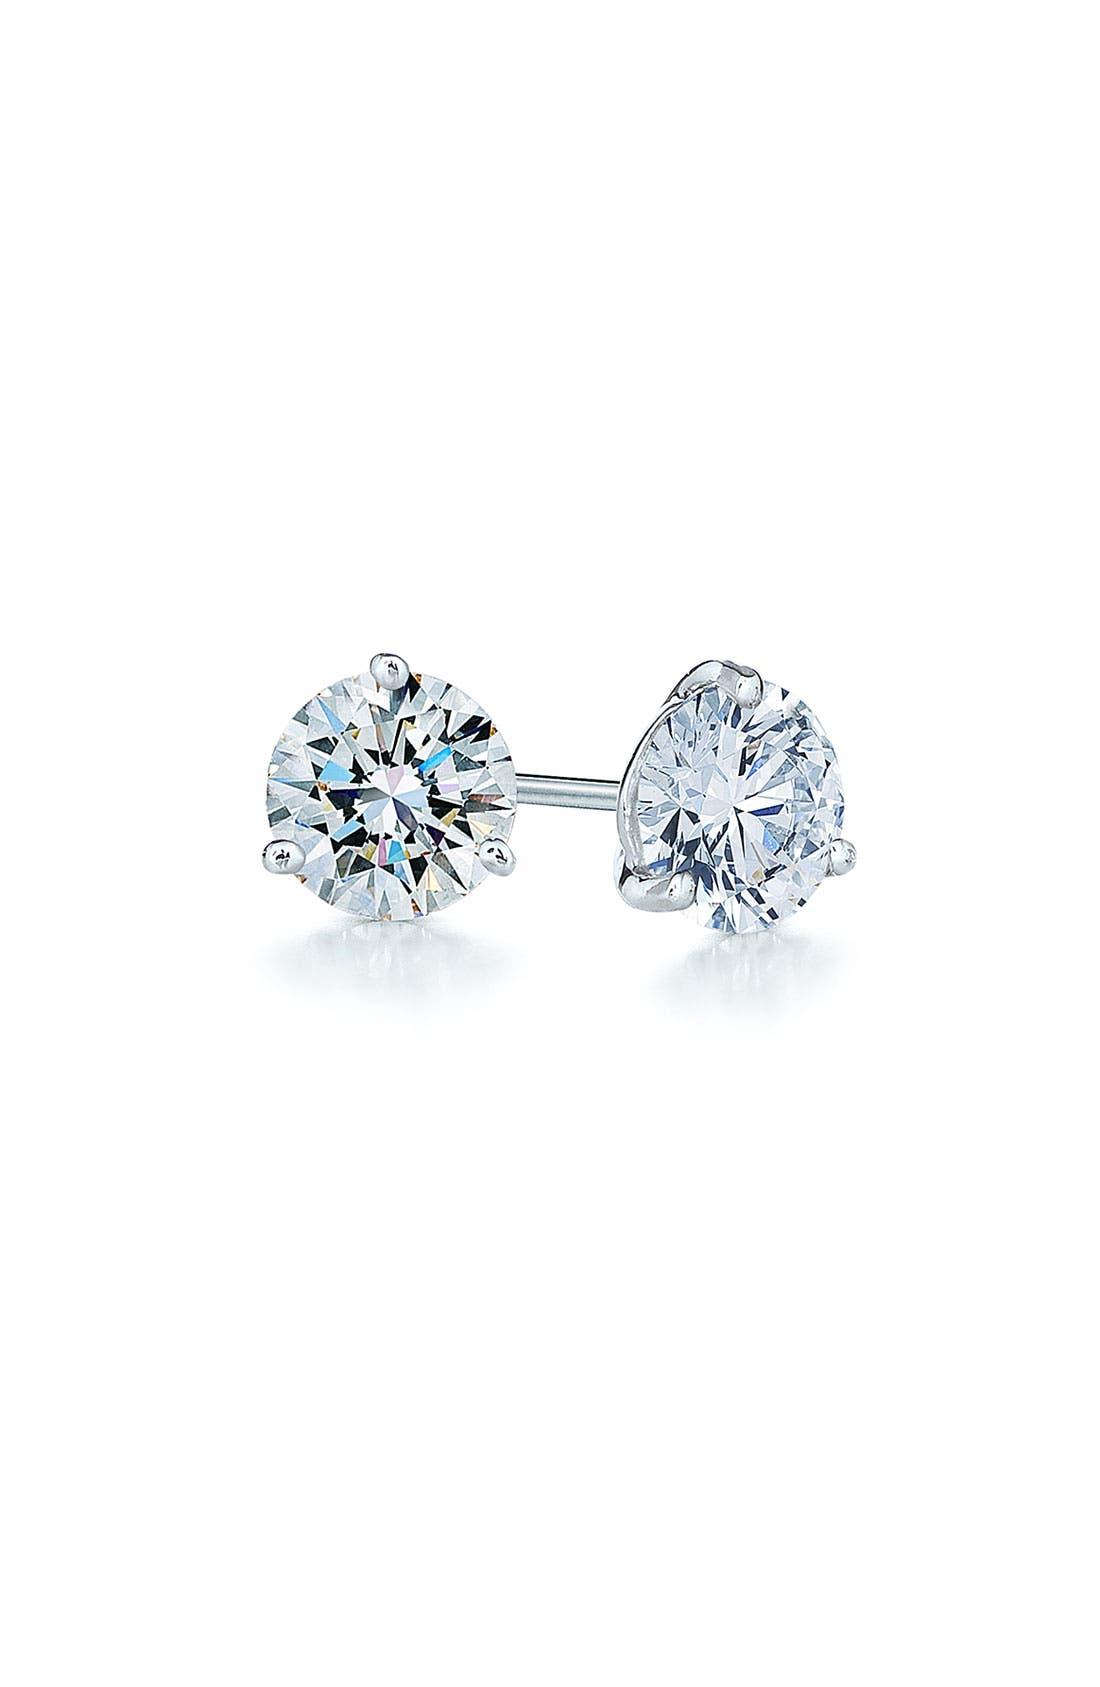 0.33ct tw Diamond & Platinum Stud Earrings,                         Main,                         color, PLATINUM